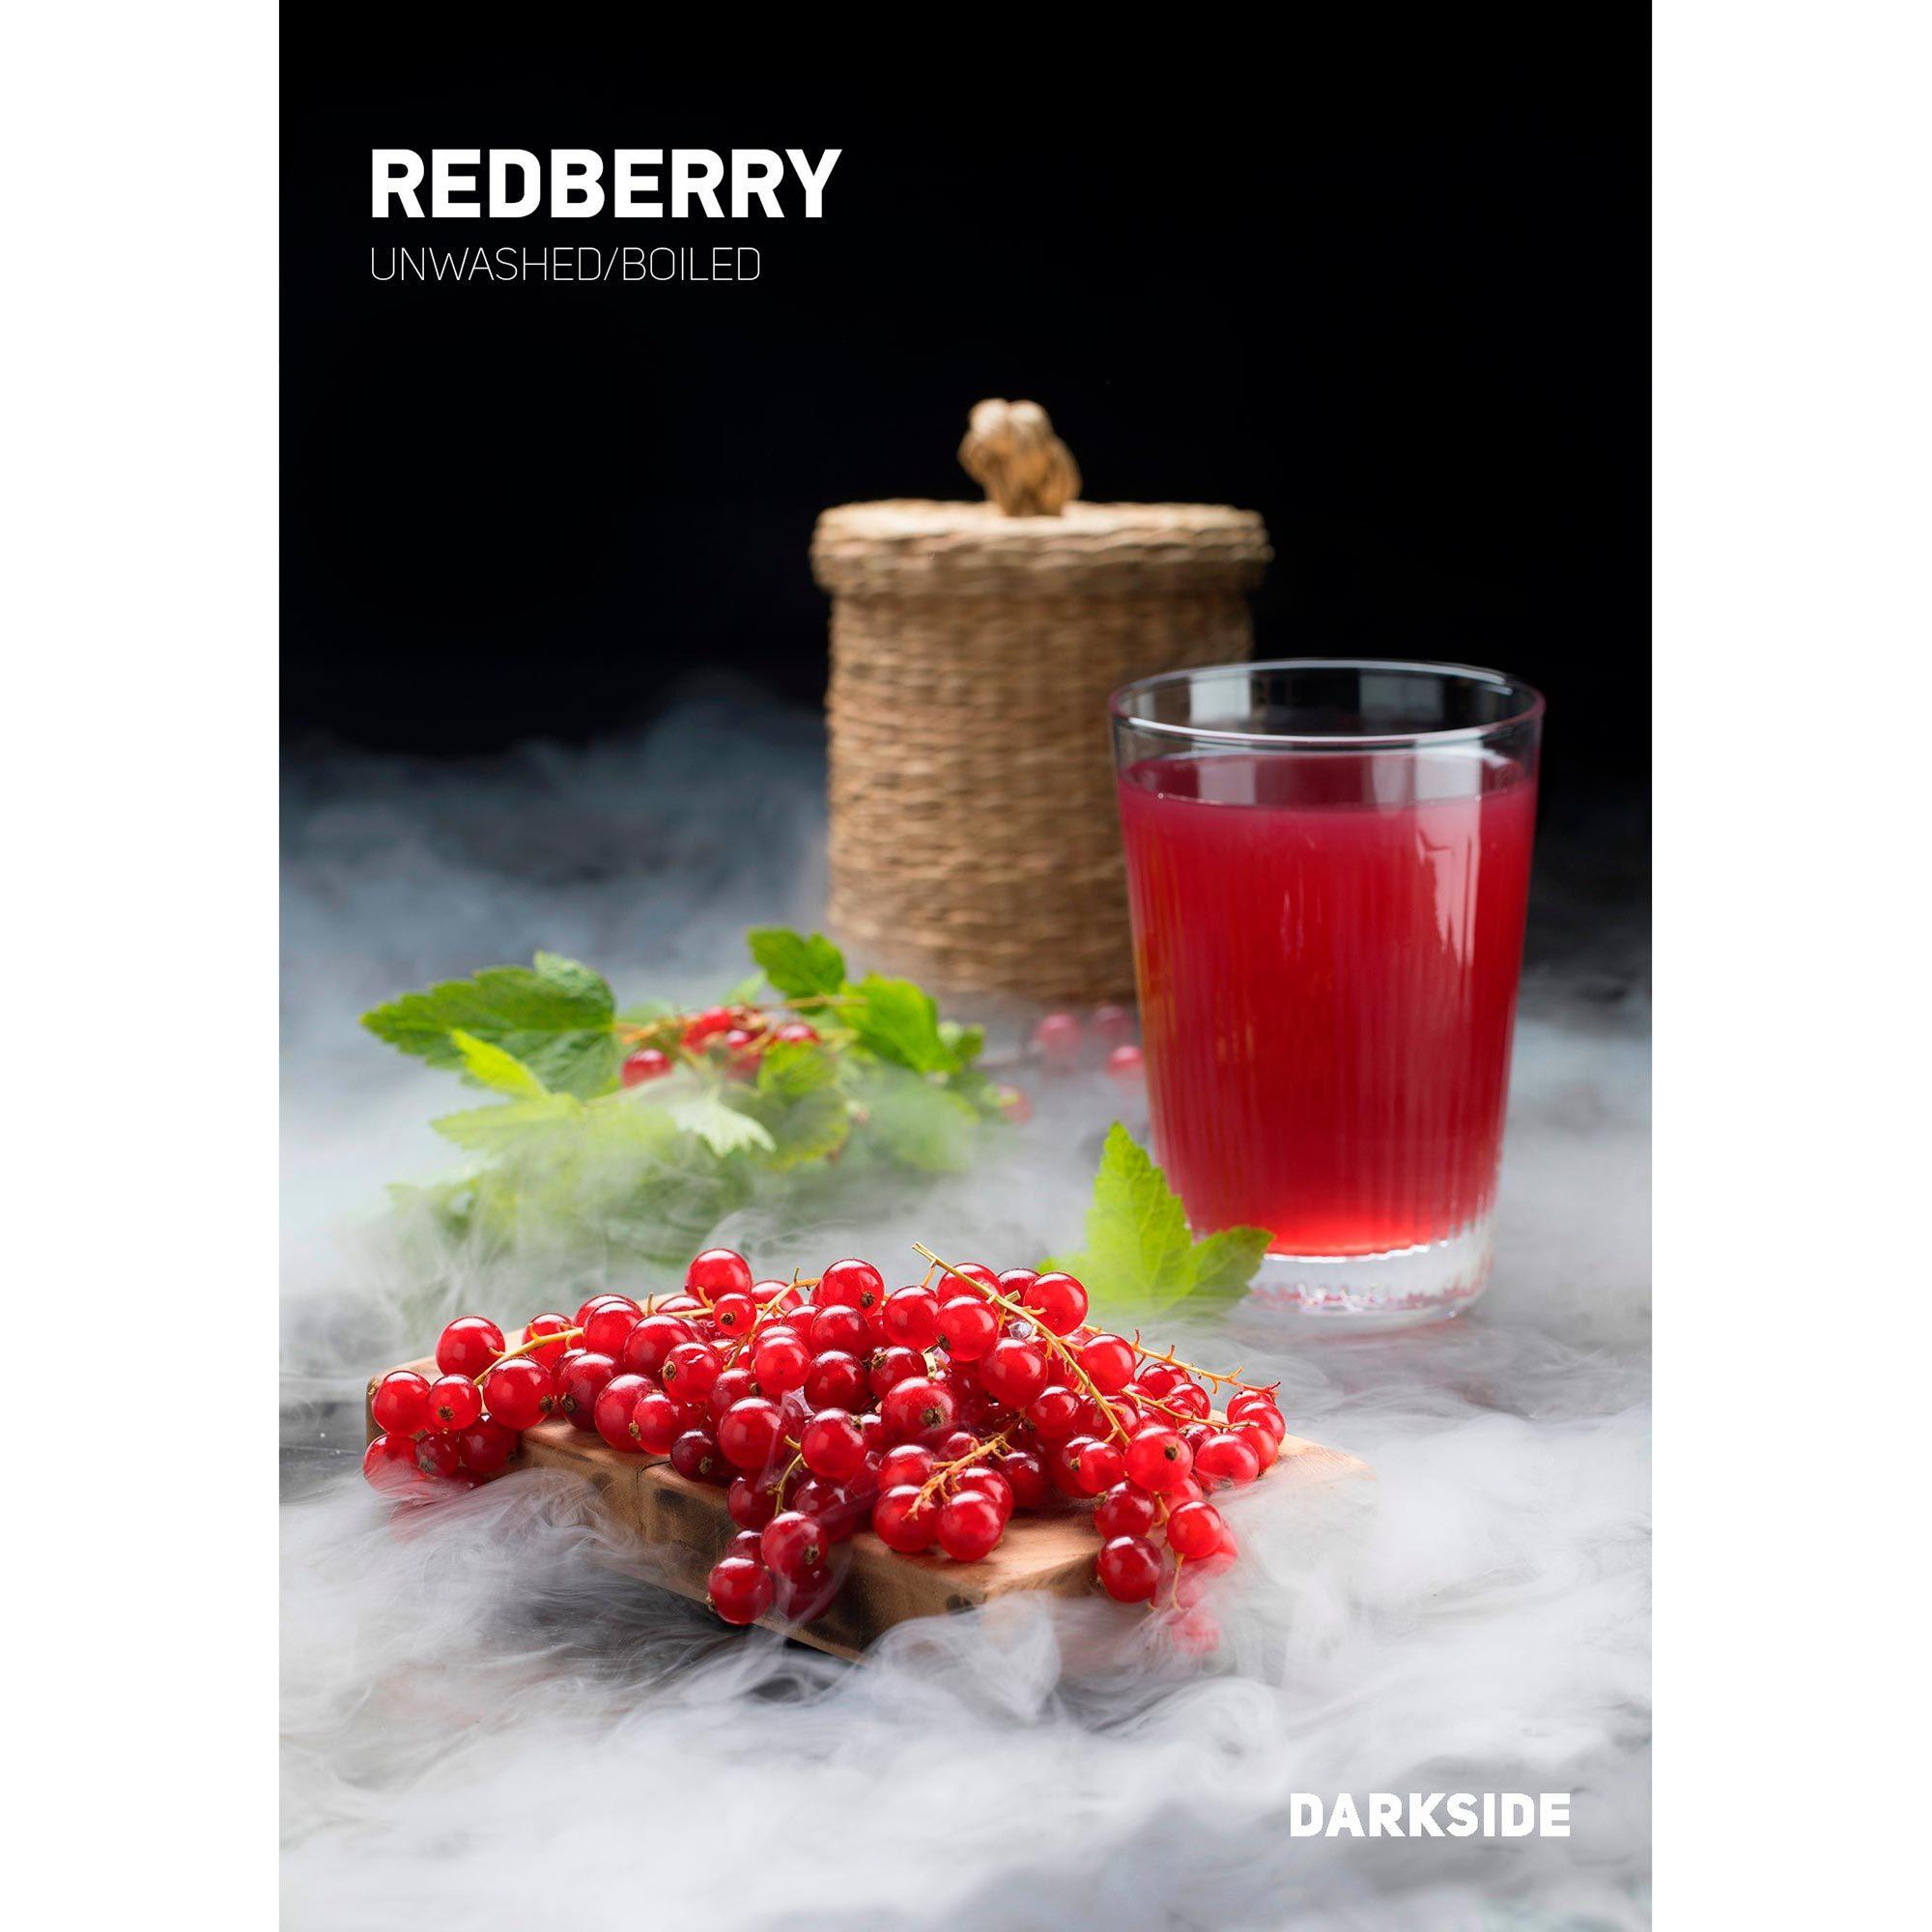 Табак для кальяна Dark Side Core 100 гр Redberry, магазин FOHM